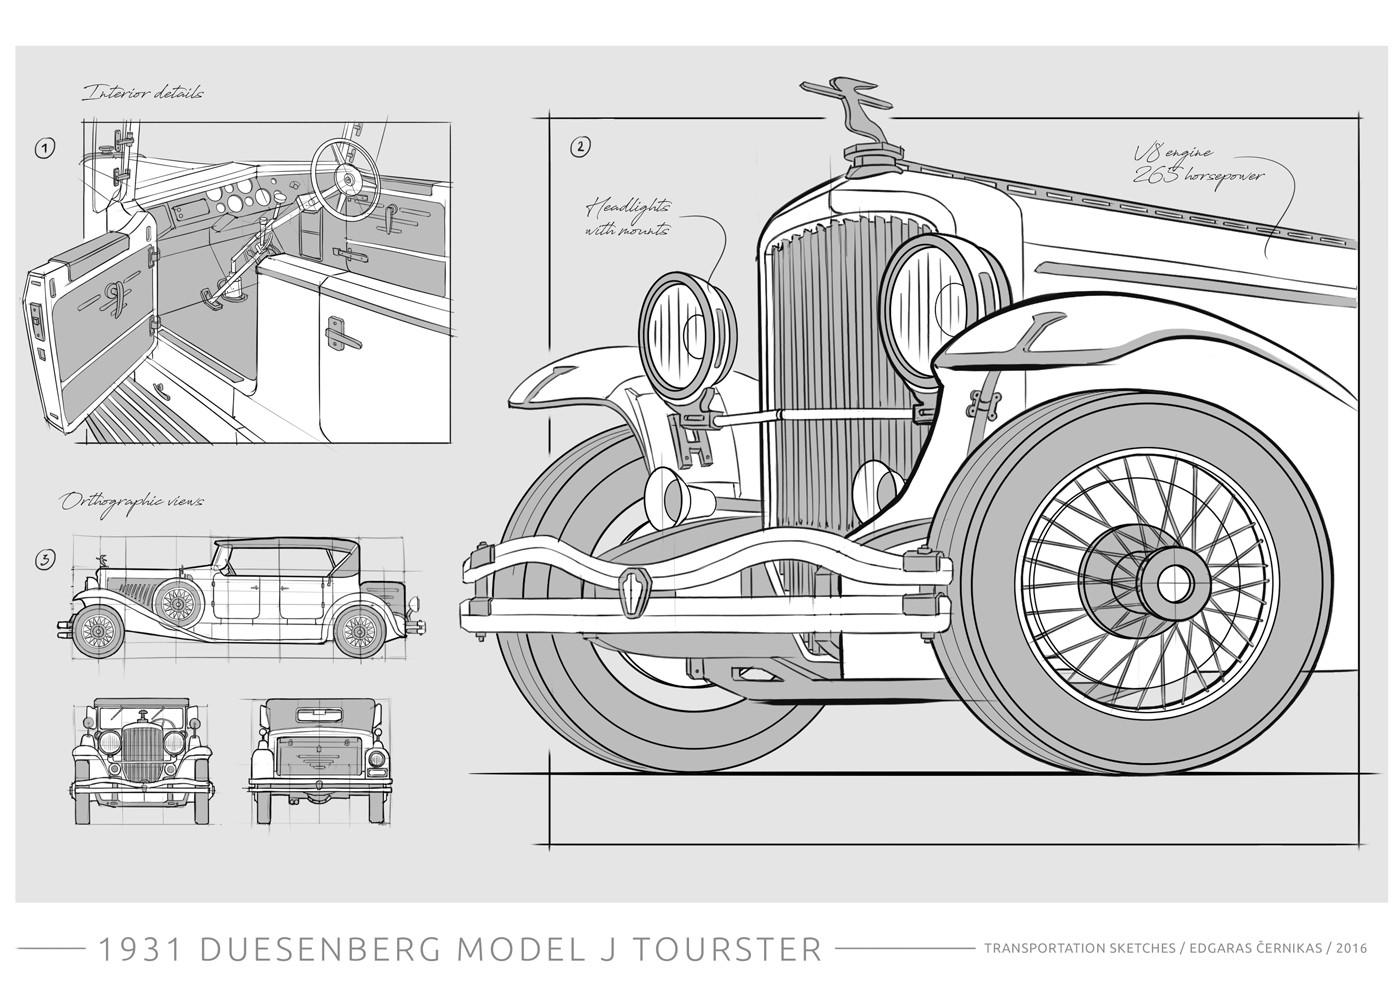 Edgaras cernikas transportation sketches duesenberg j derham tourster 1400x990 02